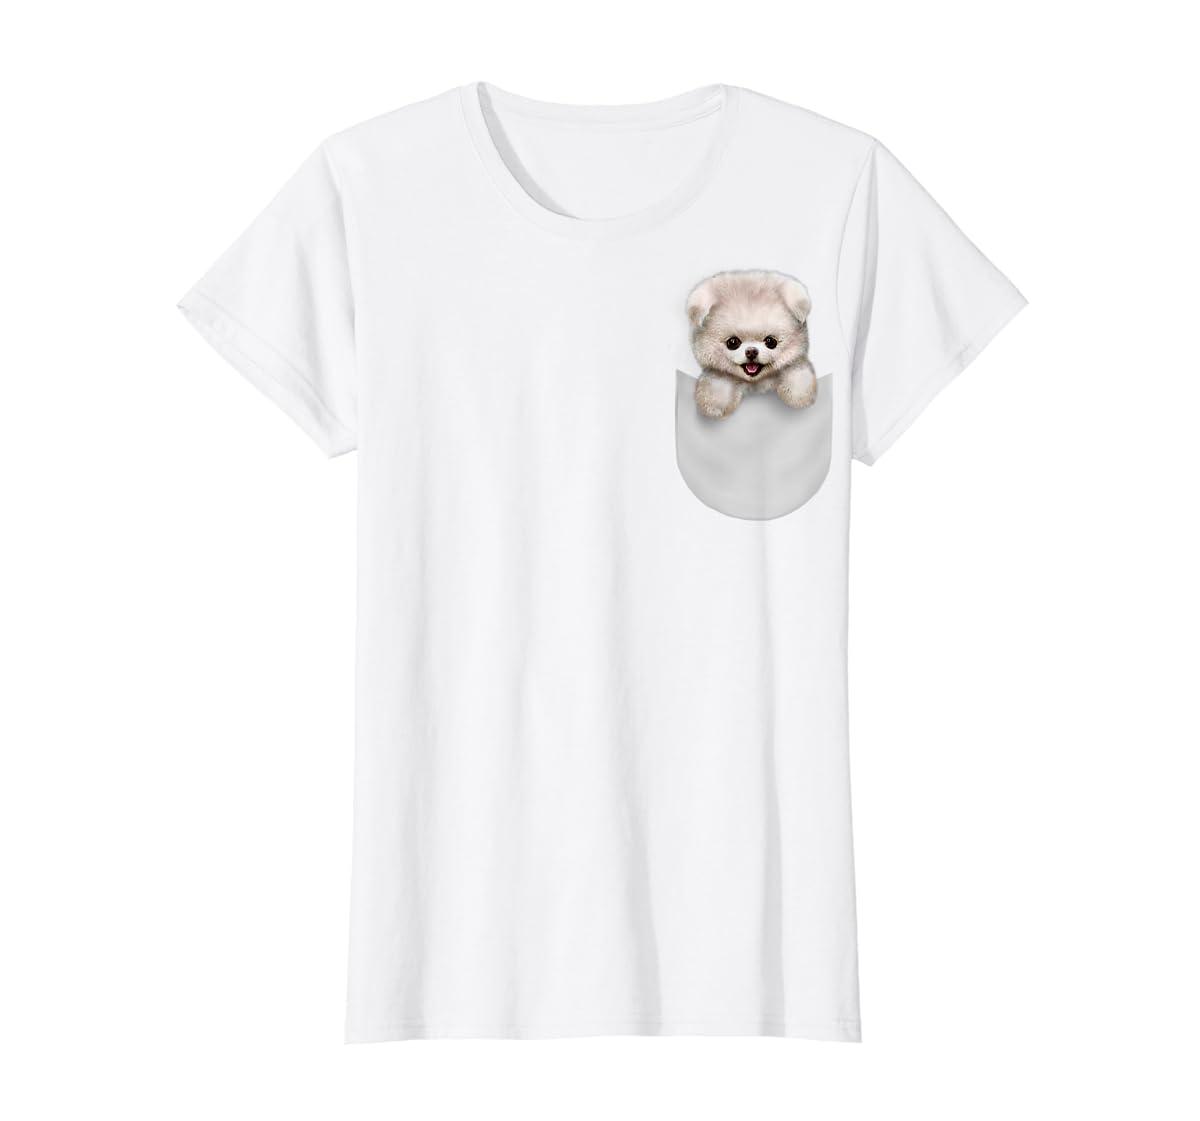 T-Shirt, Cute White Fluffy Pomeranian Puppy in Pocket, Dog-Women's T-Shirt-White